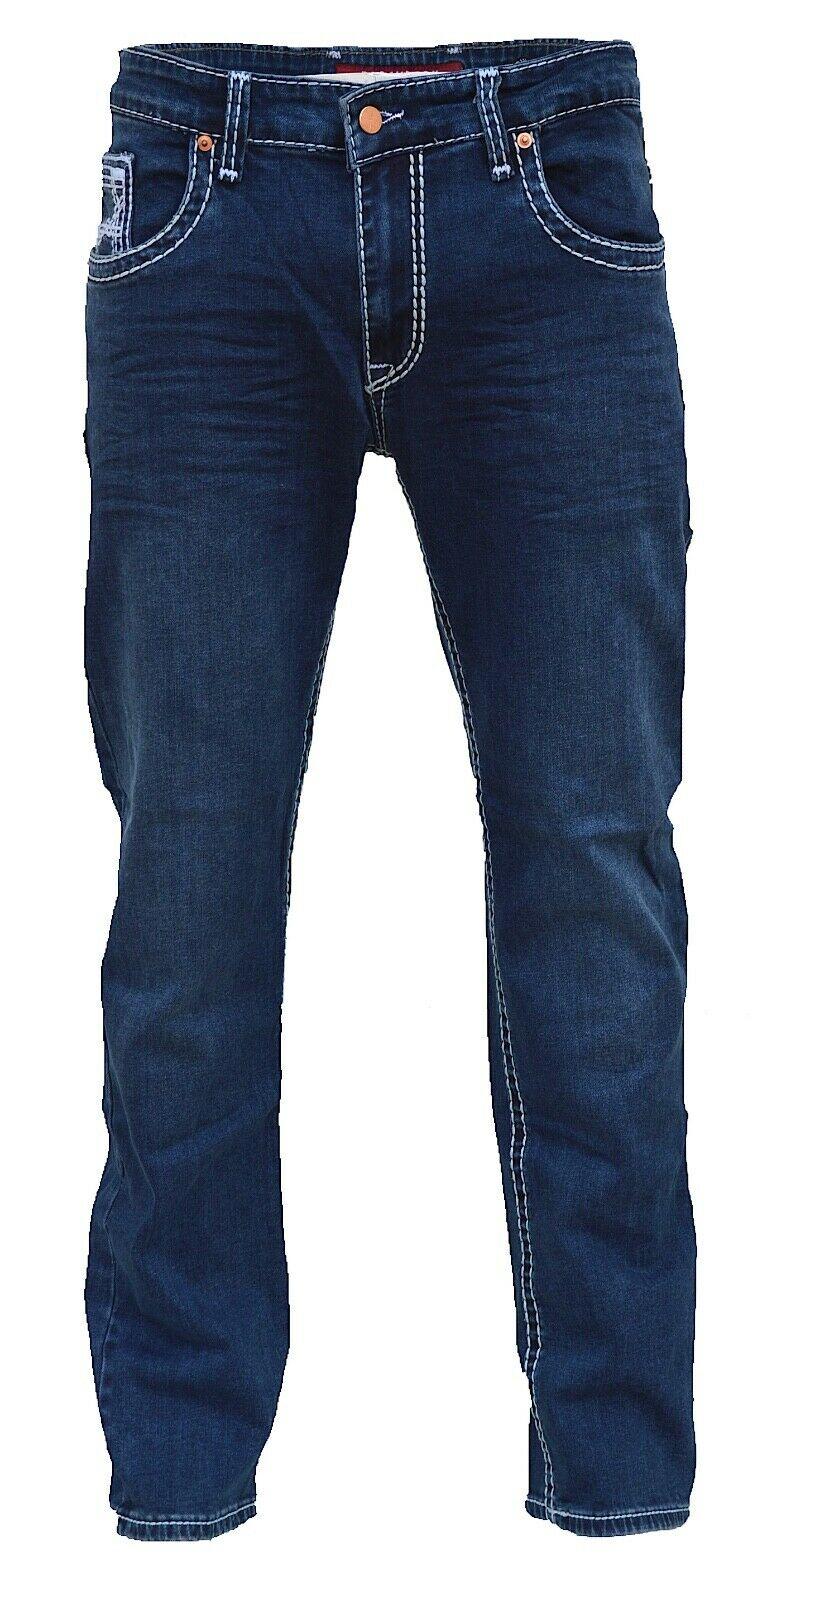 Herren-Jeans-Hose-Denim-KC-Black-Washed-Straight-Cut-Regular-Dicke-Naht-naehte Indexbild 22